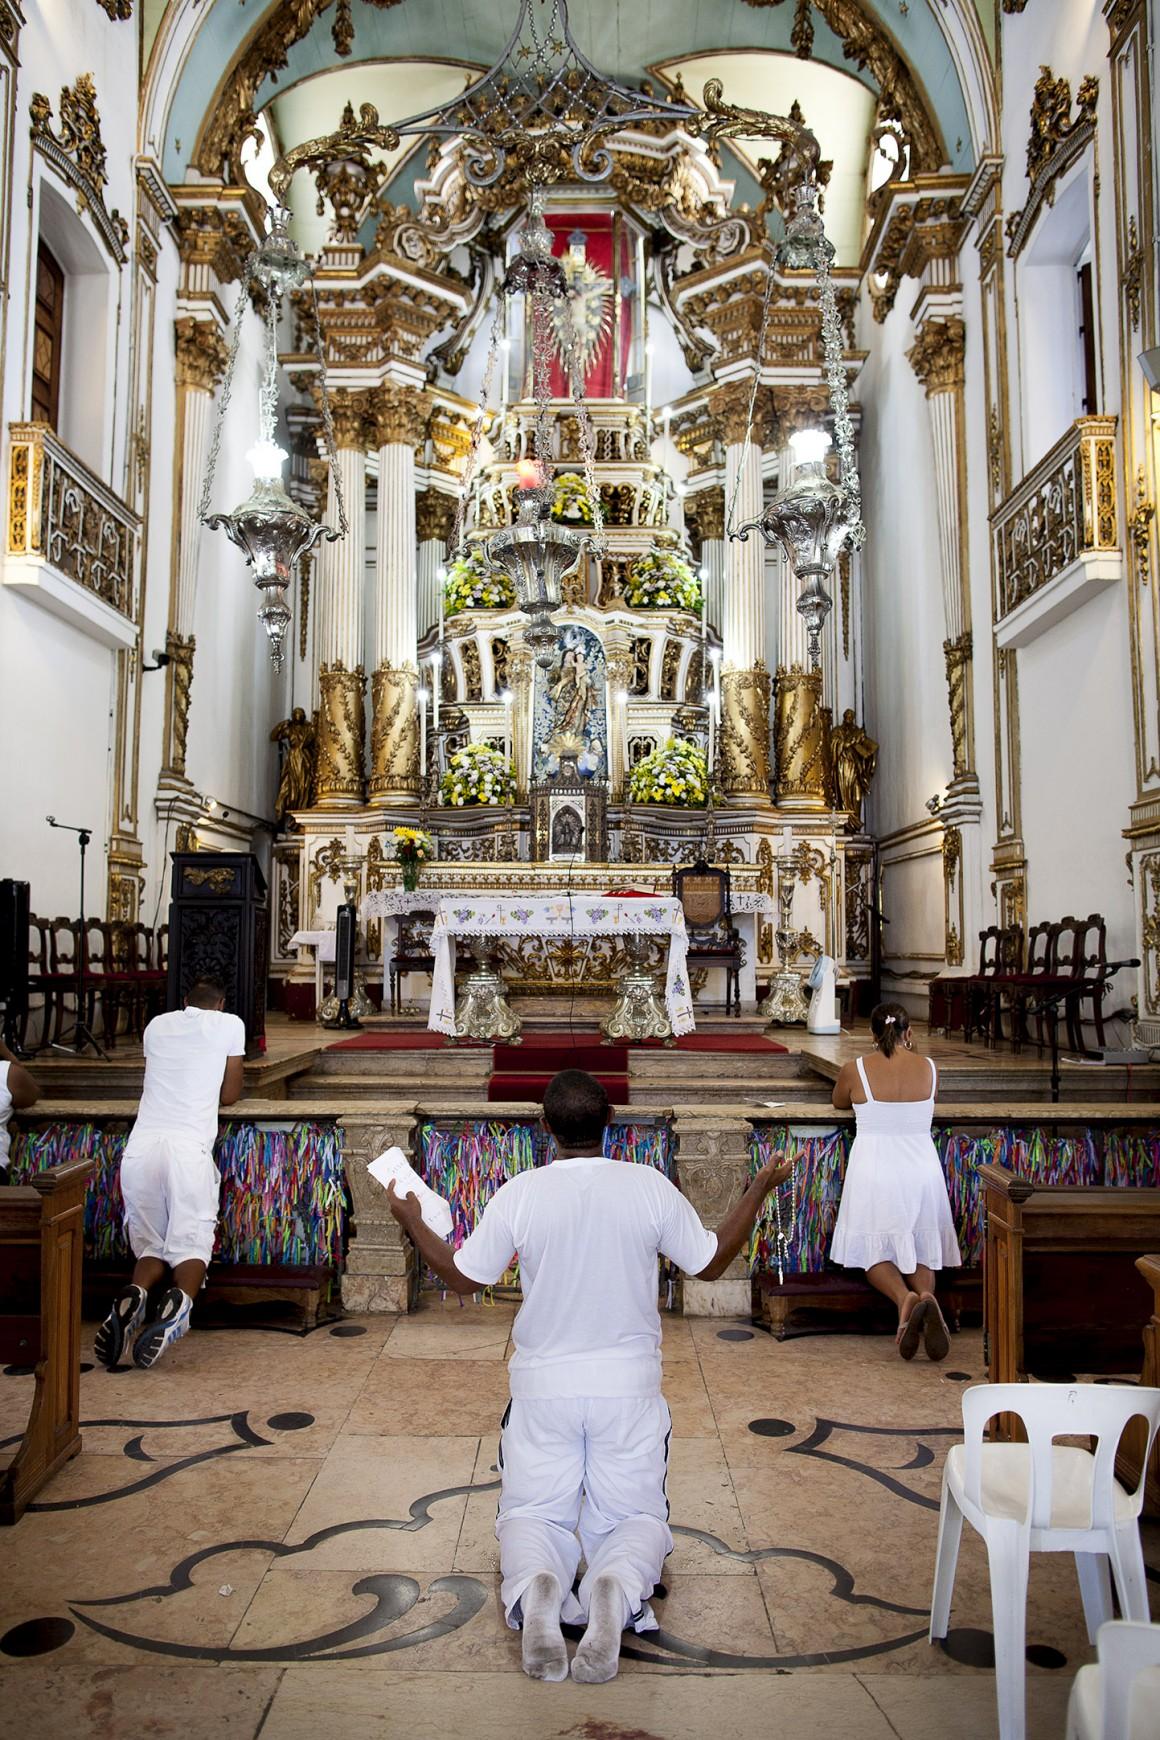 Os devotos na igreja do Bonfim